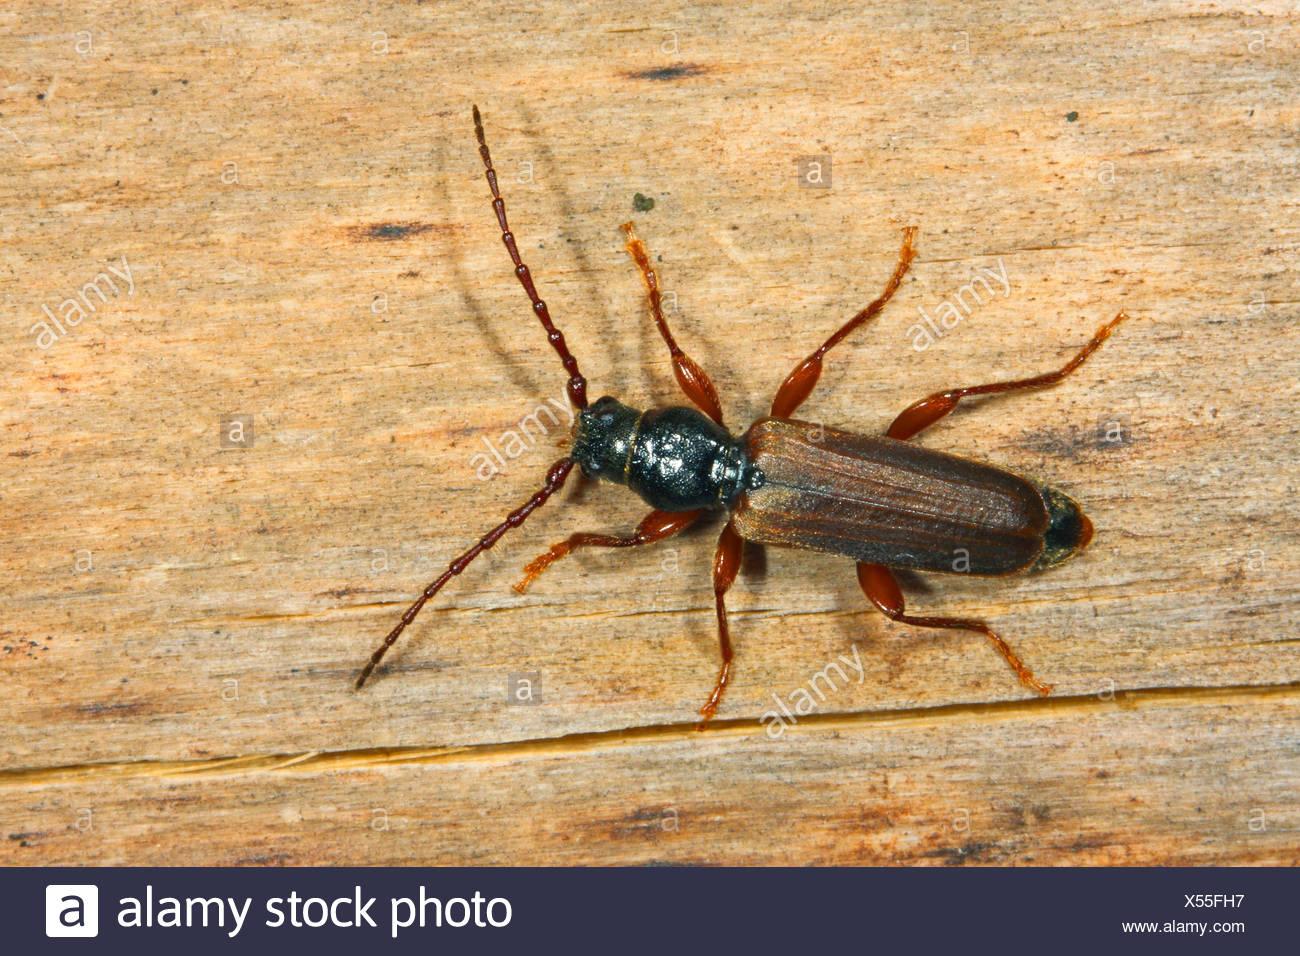 Black spruce beetle, Black spruce long-horn beetle, European spruce longhorn beetle (Tetropium castaneum, Tetropium luridum), on deadwood, Germany - Stock Image